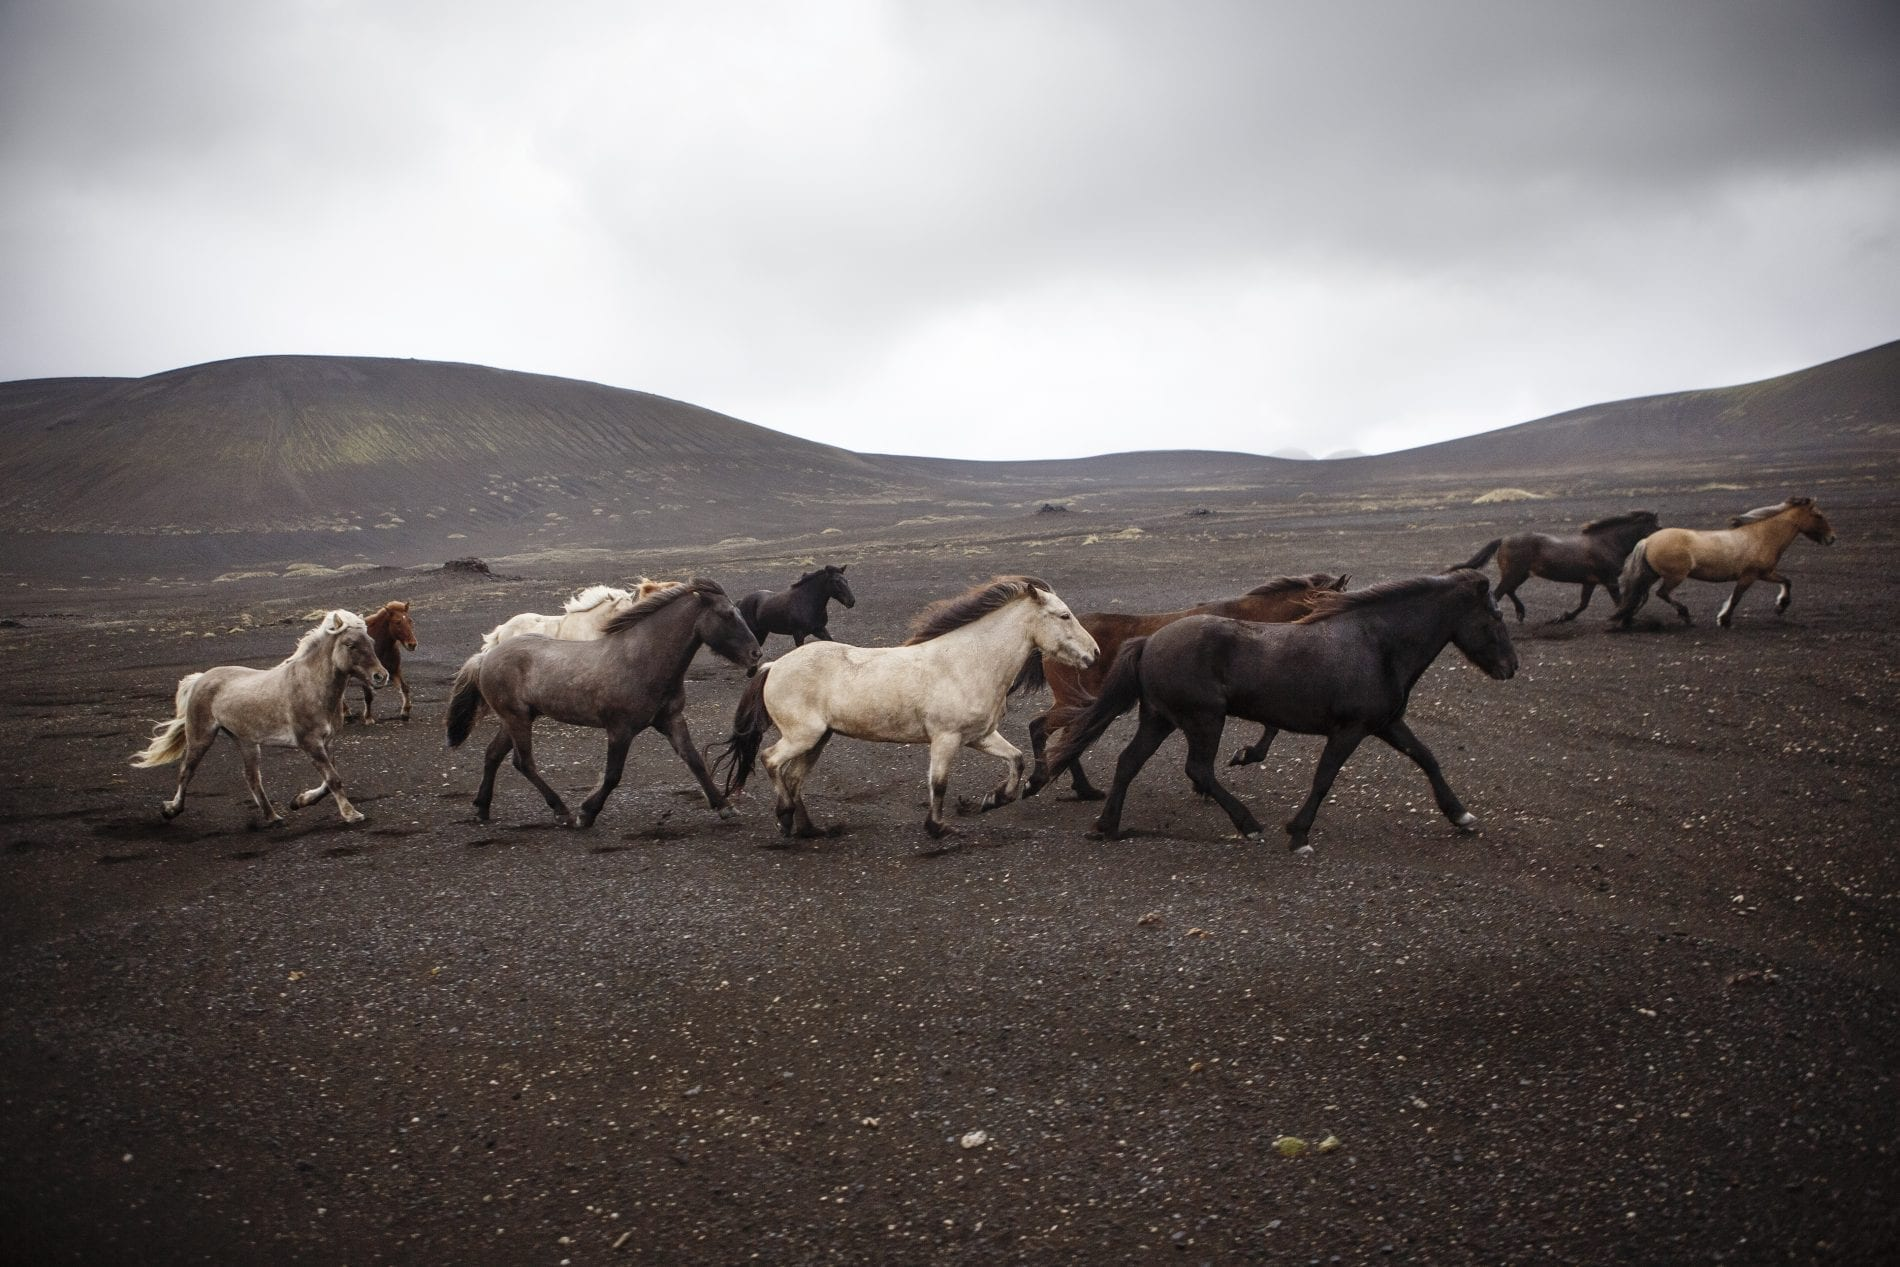 Heard of horses in the black volcanic sand between Landmannalaugar and Hekla